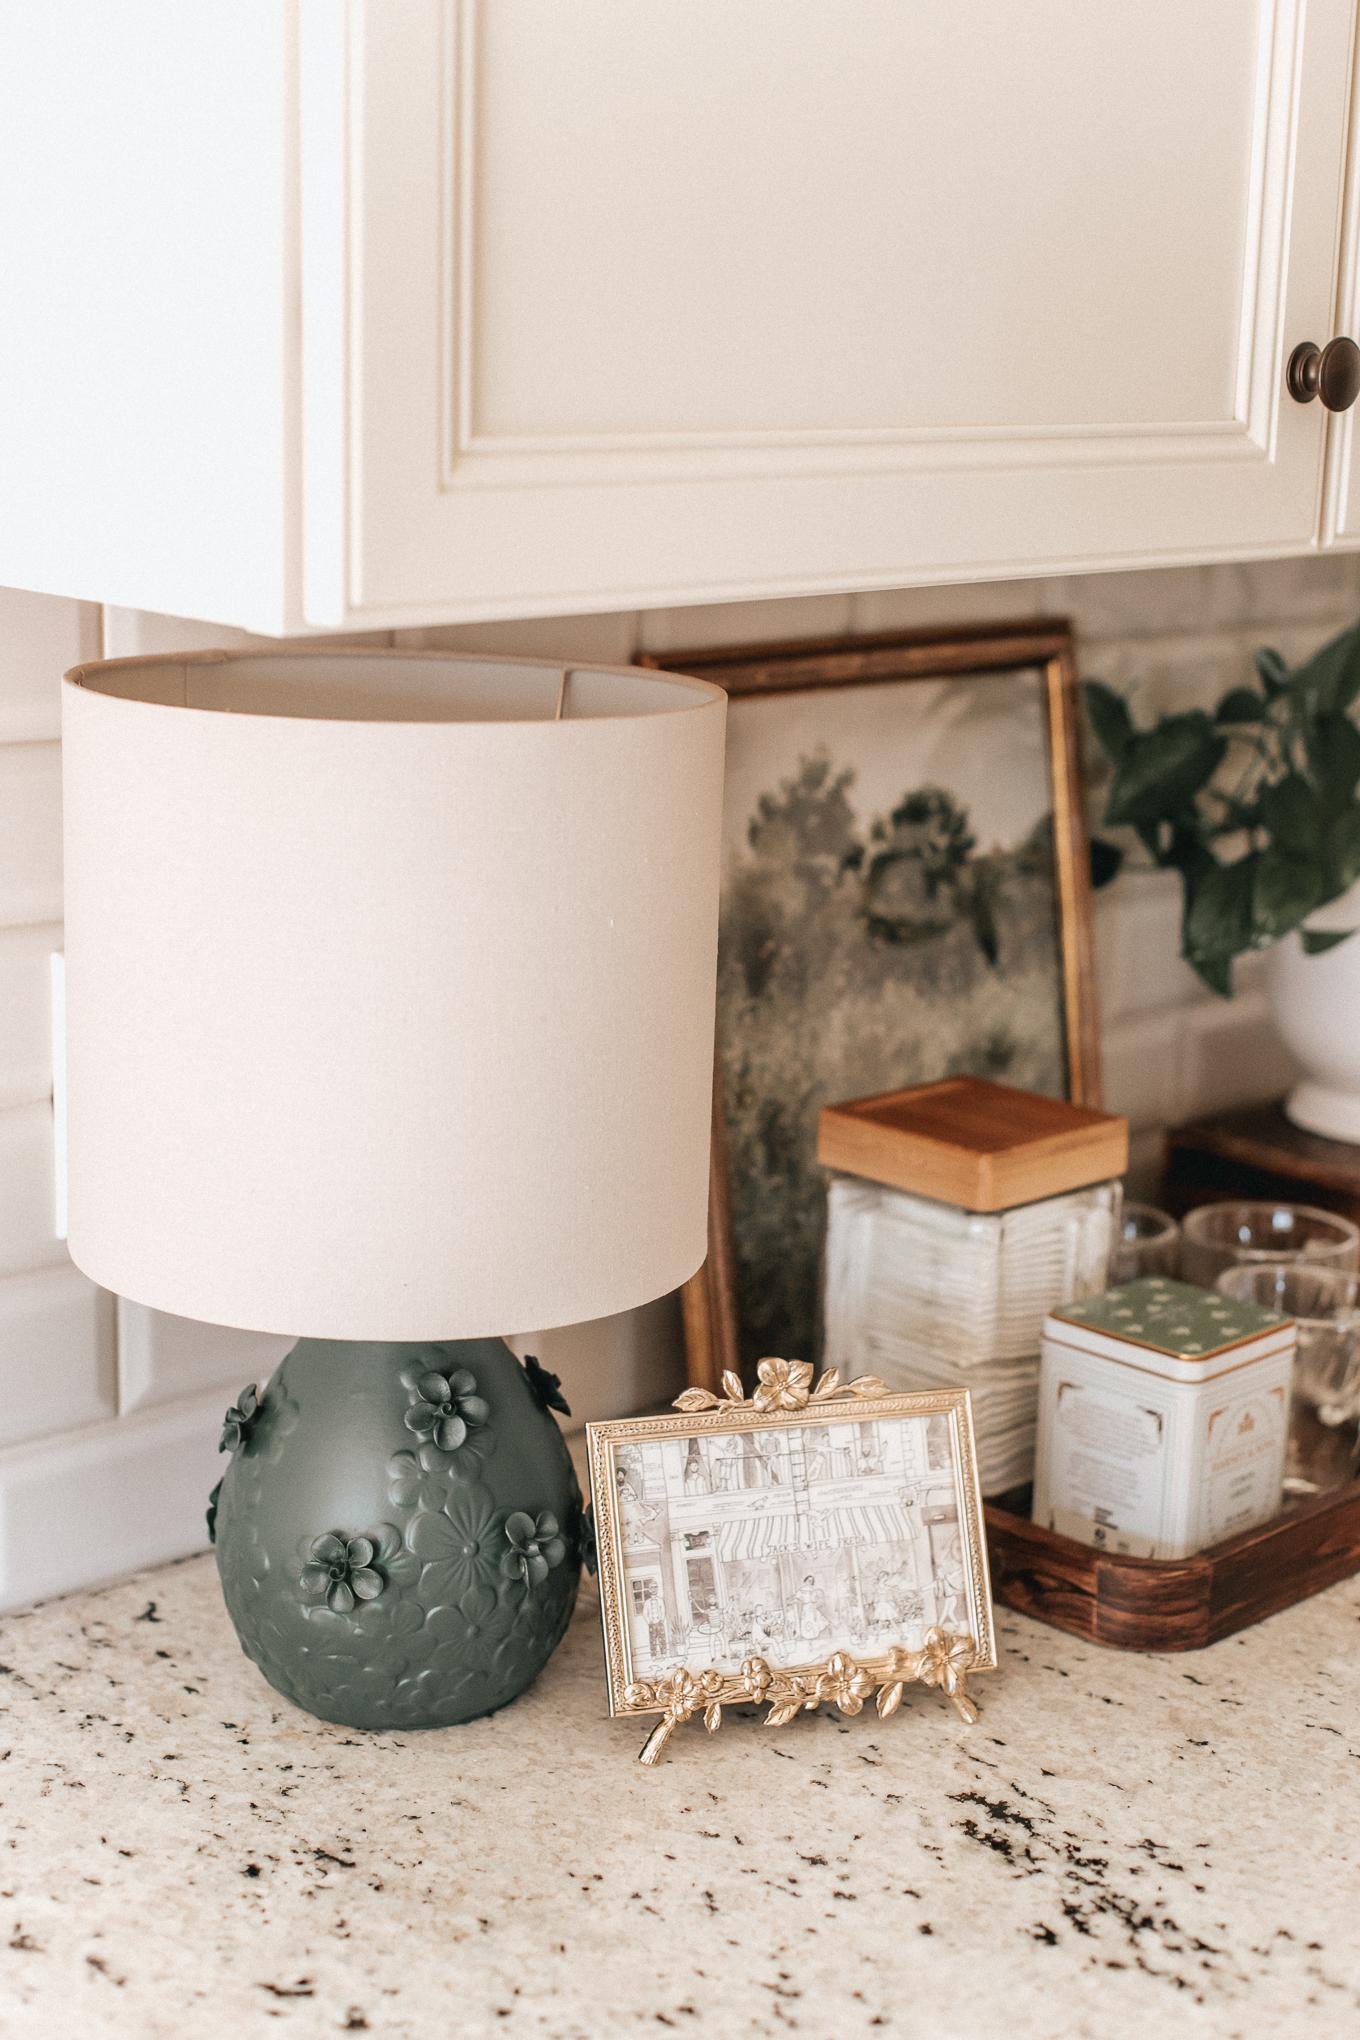 Kitchen Lamp | Louella Reese